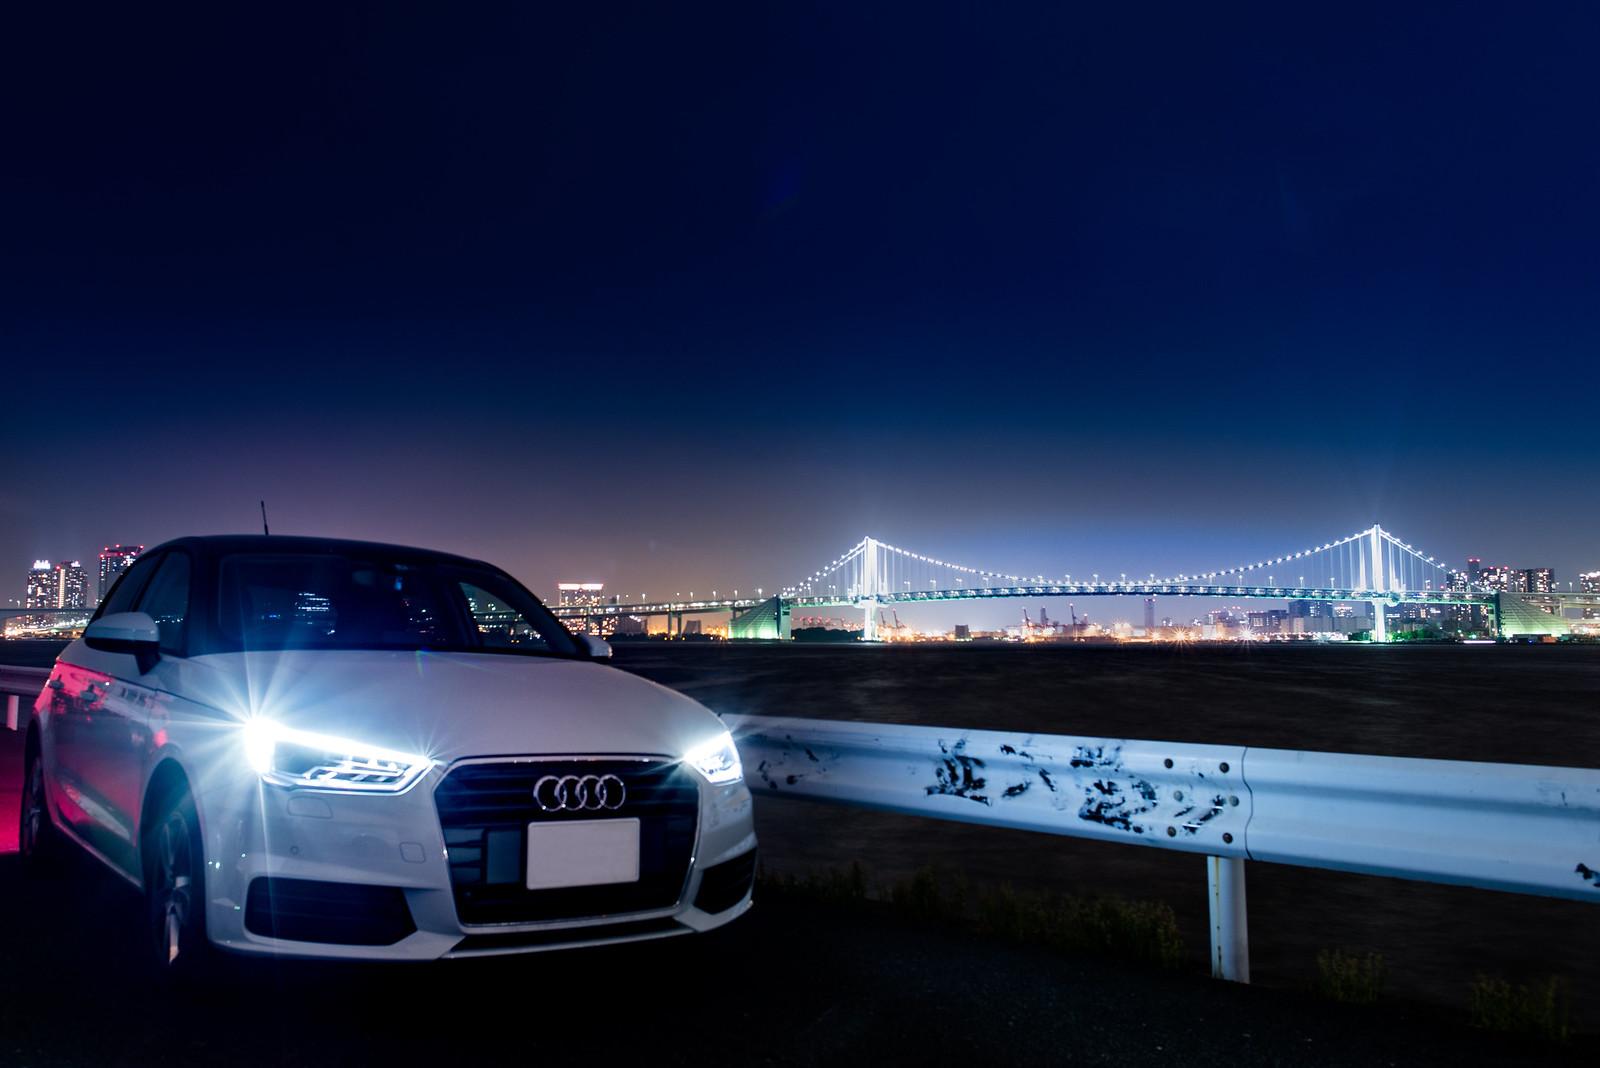 The Rainbow Bridge & Audi